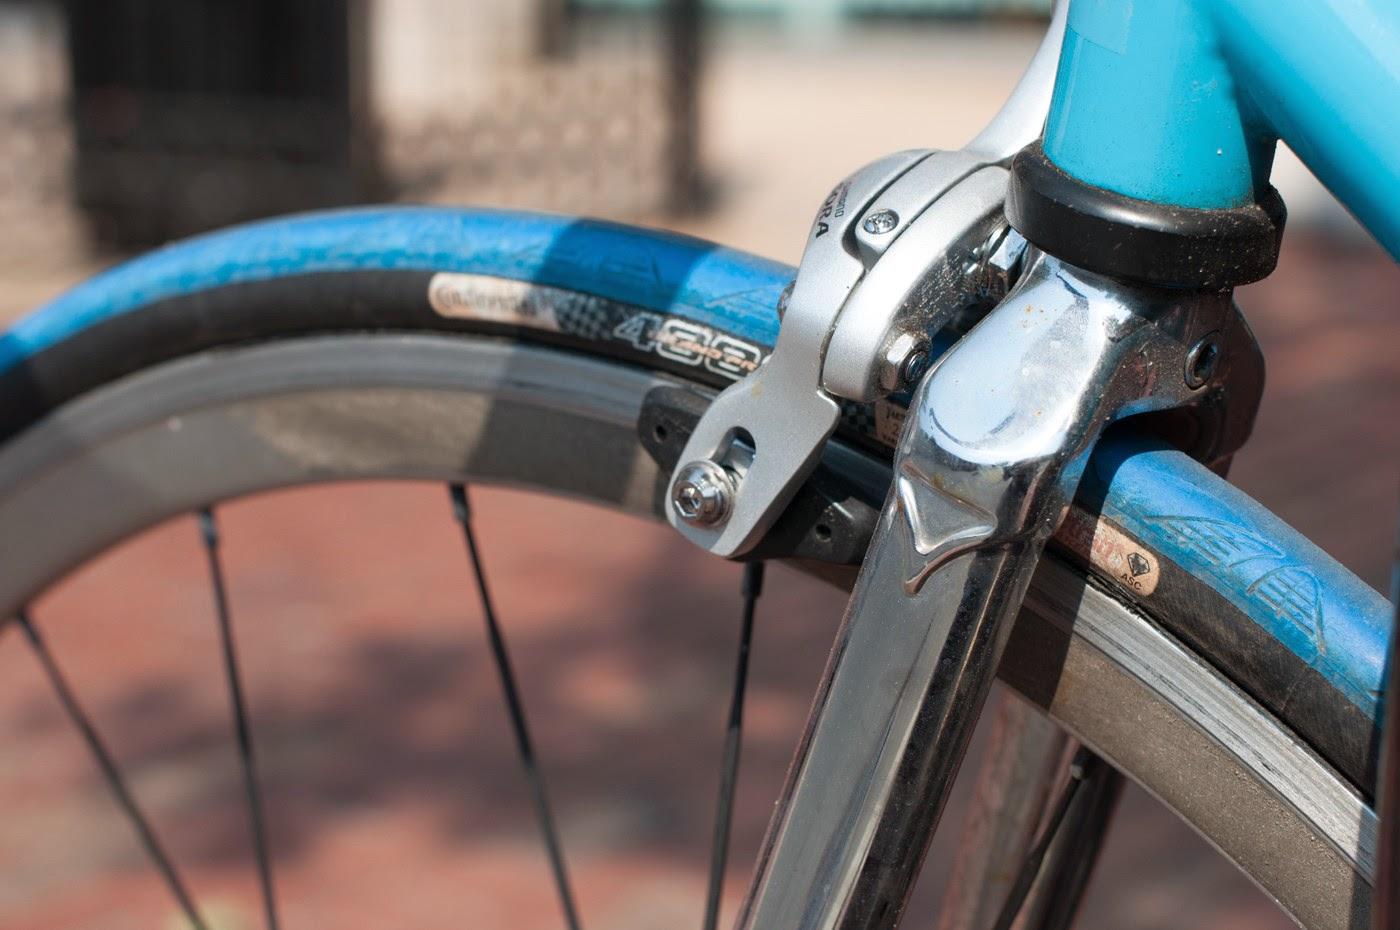 Fixie, fixed speed, bicycle, boston, USA, custom, customised, blue, tim Macauley, the biketorialist, shimano, frame, 3t, ritchey, tiagra , front brake